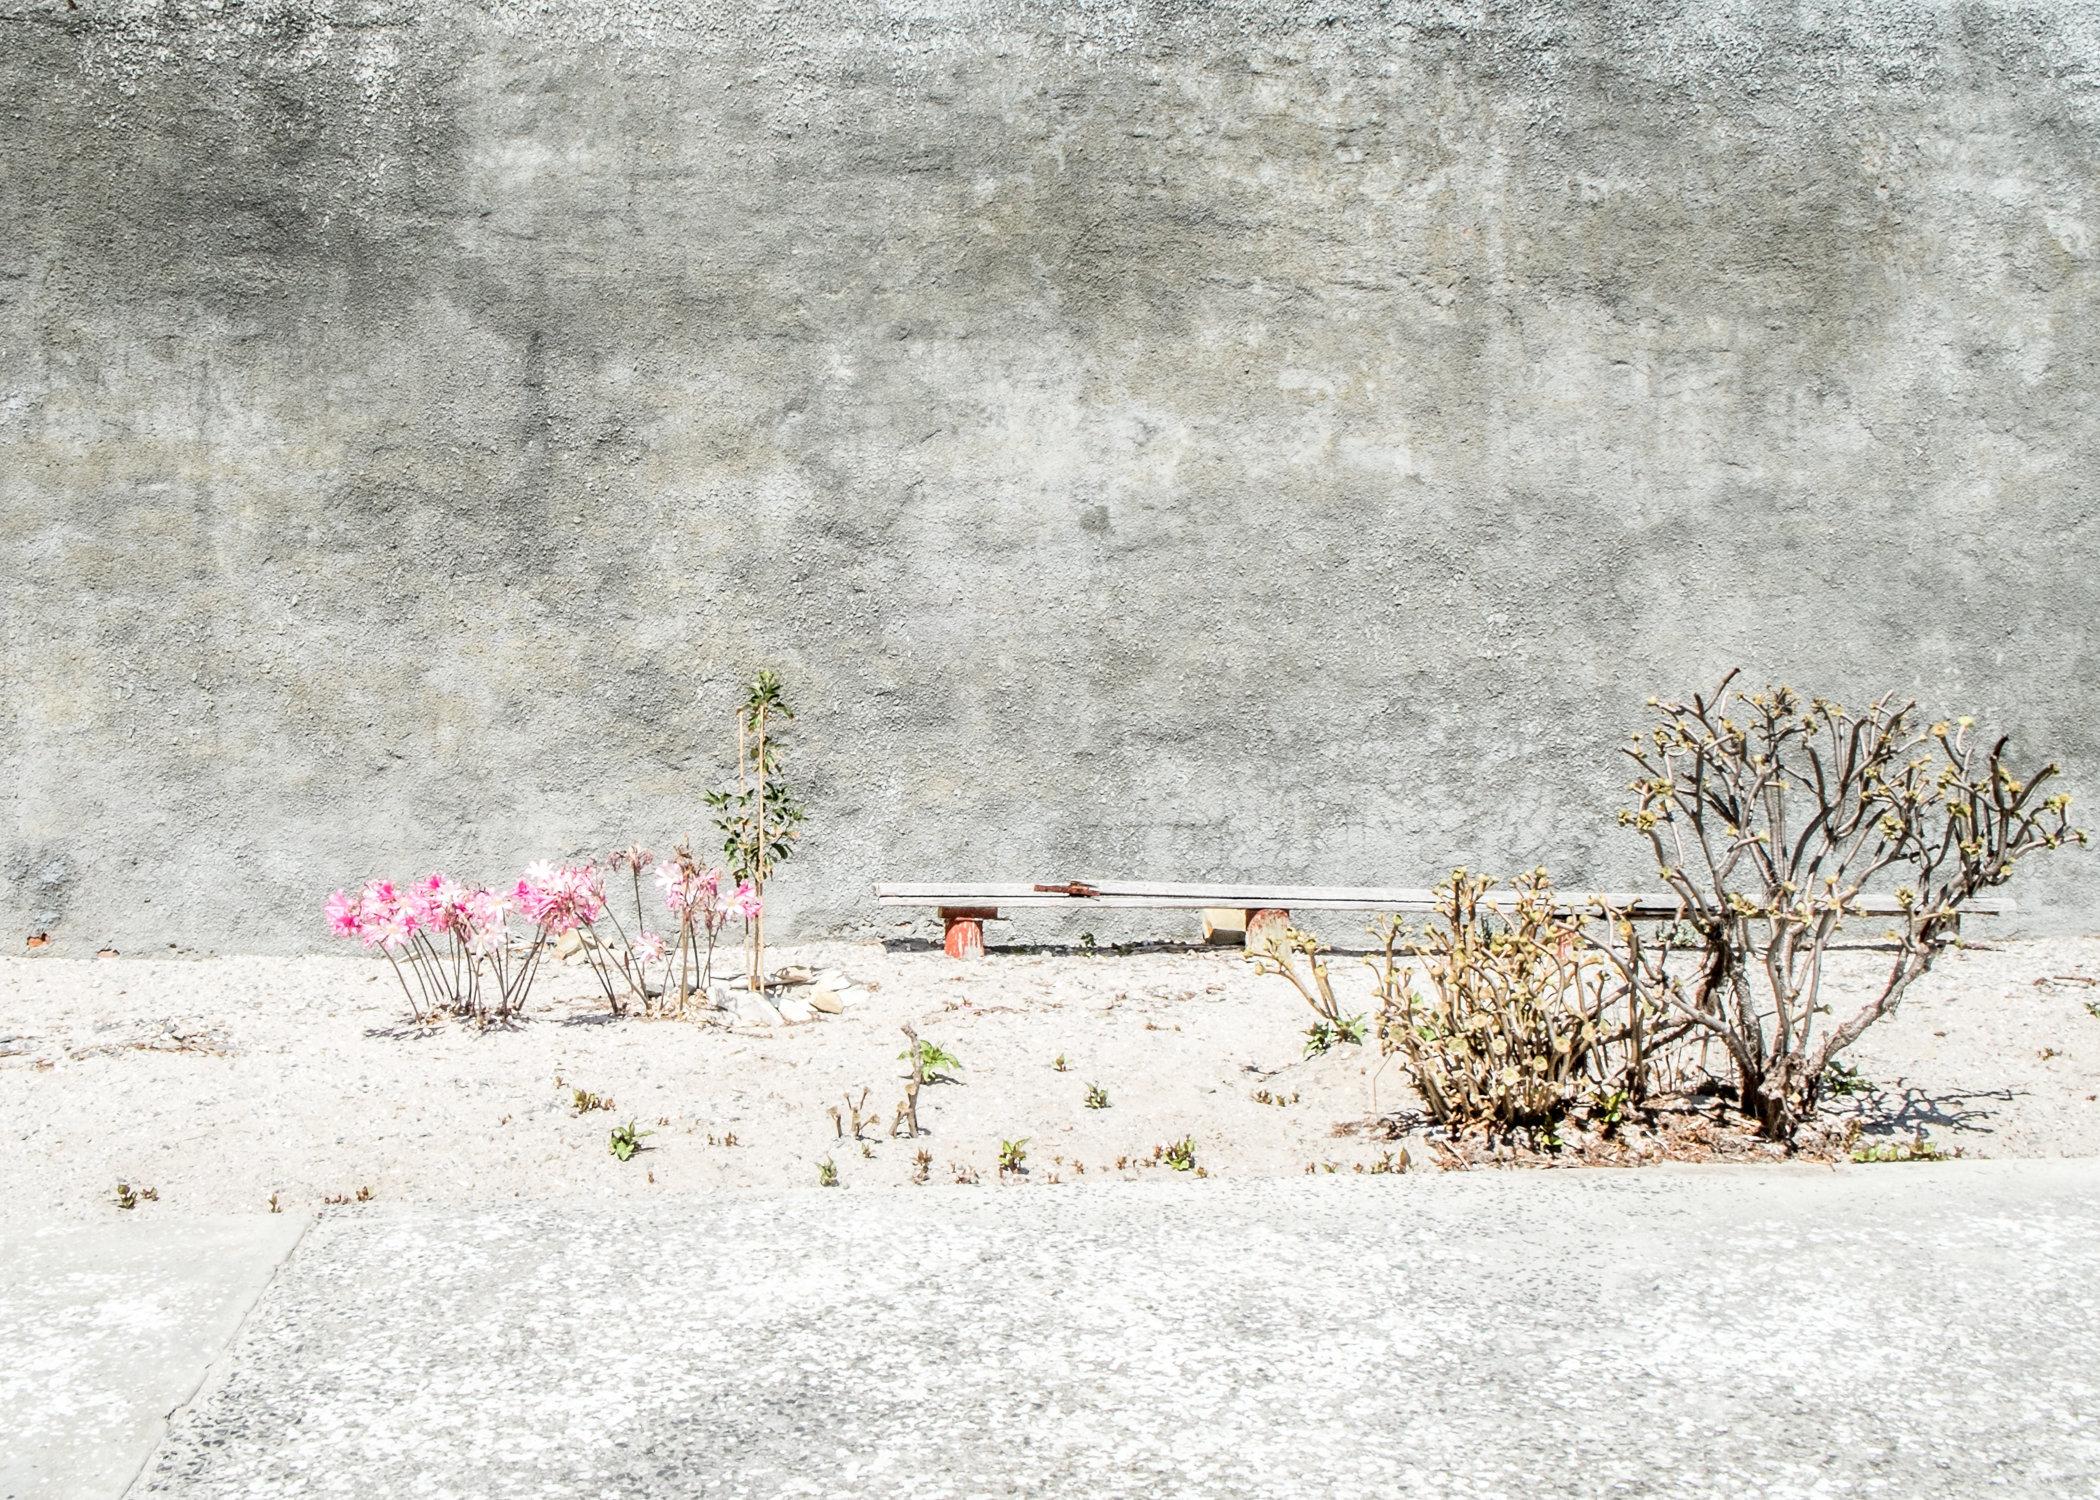 Robben_Island_Prints-8632.jpg